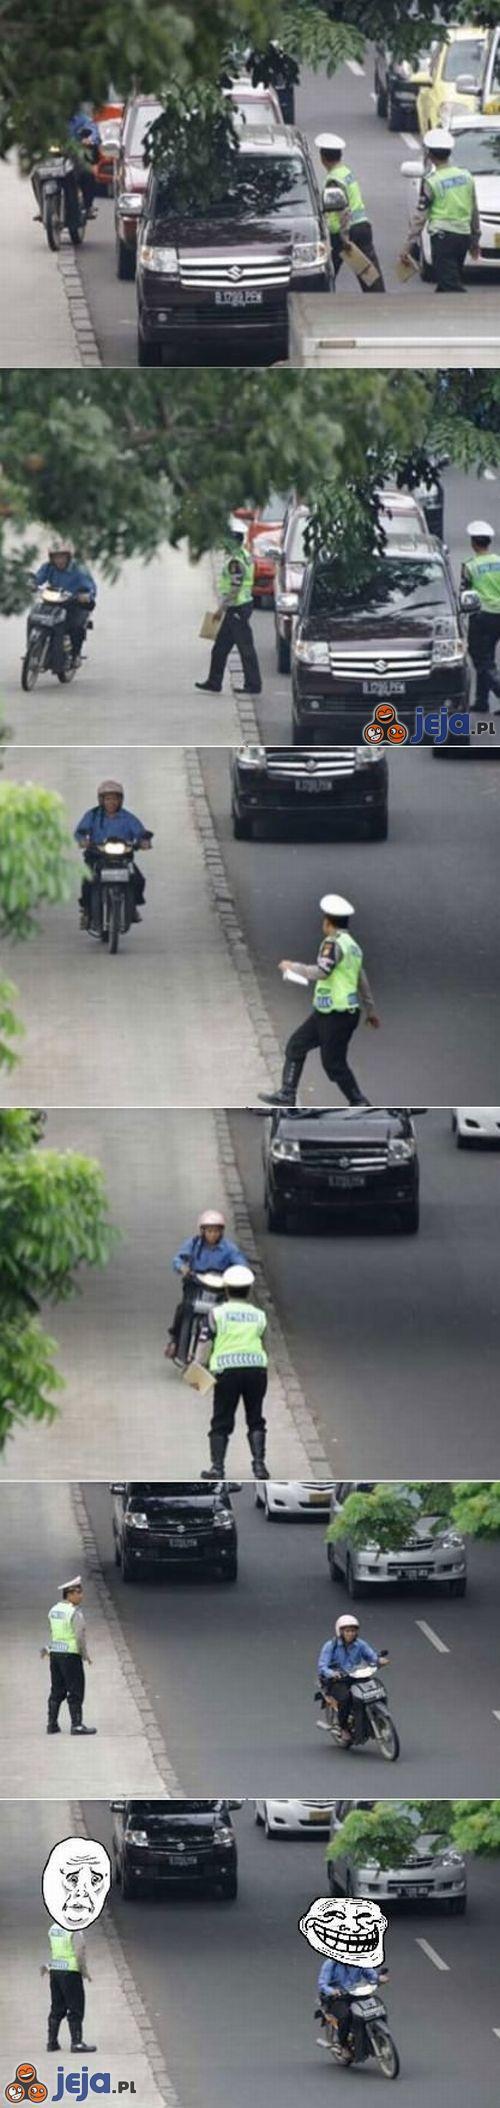 Motorem po chodniku?